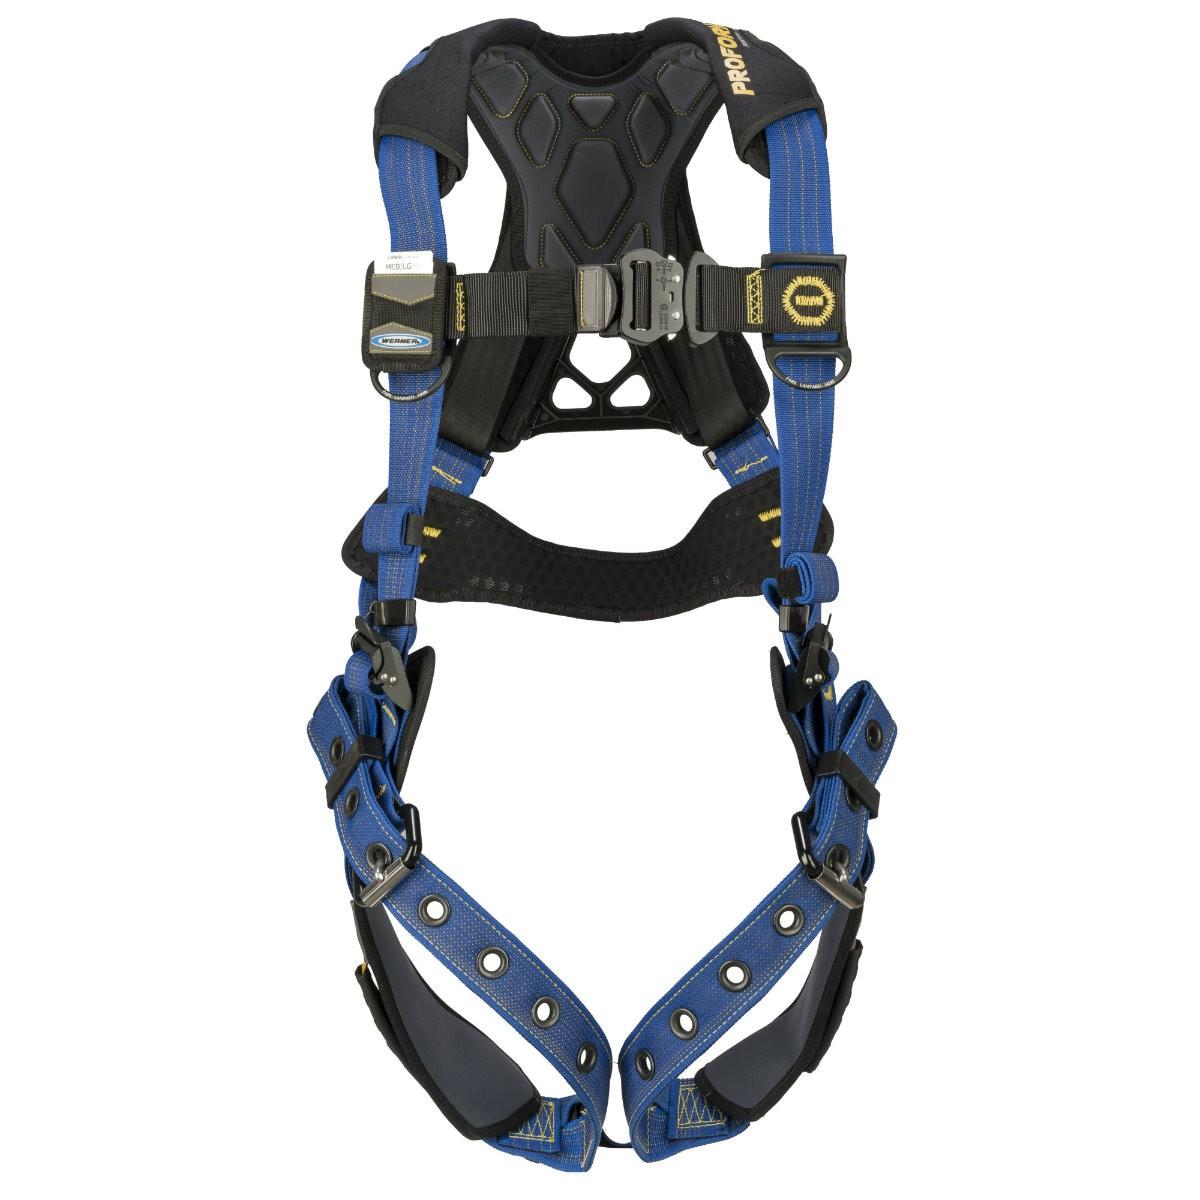 Werner H012004 ProForm F3 Standard Harness - Quick Connect Legs (XL